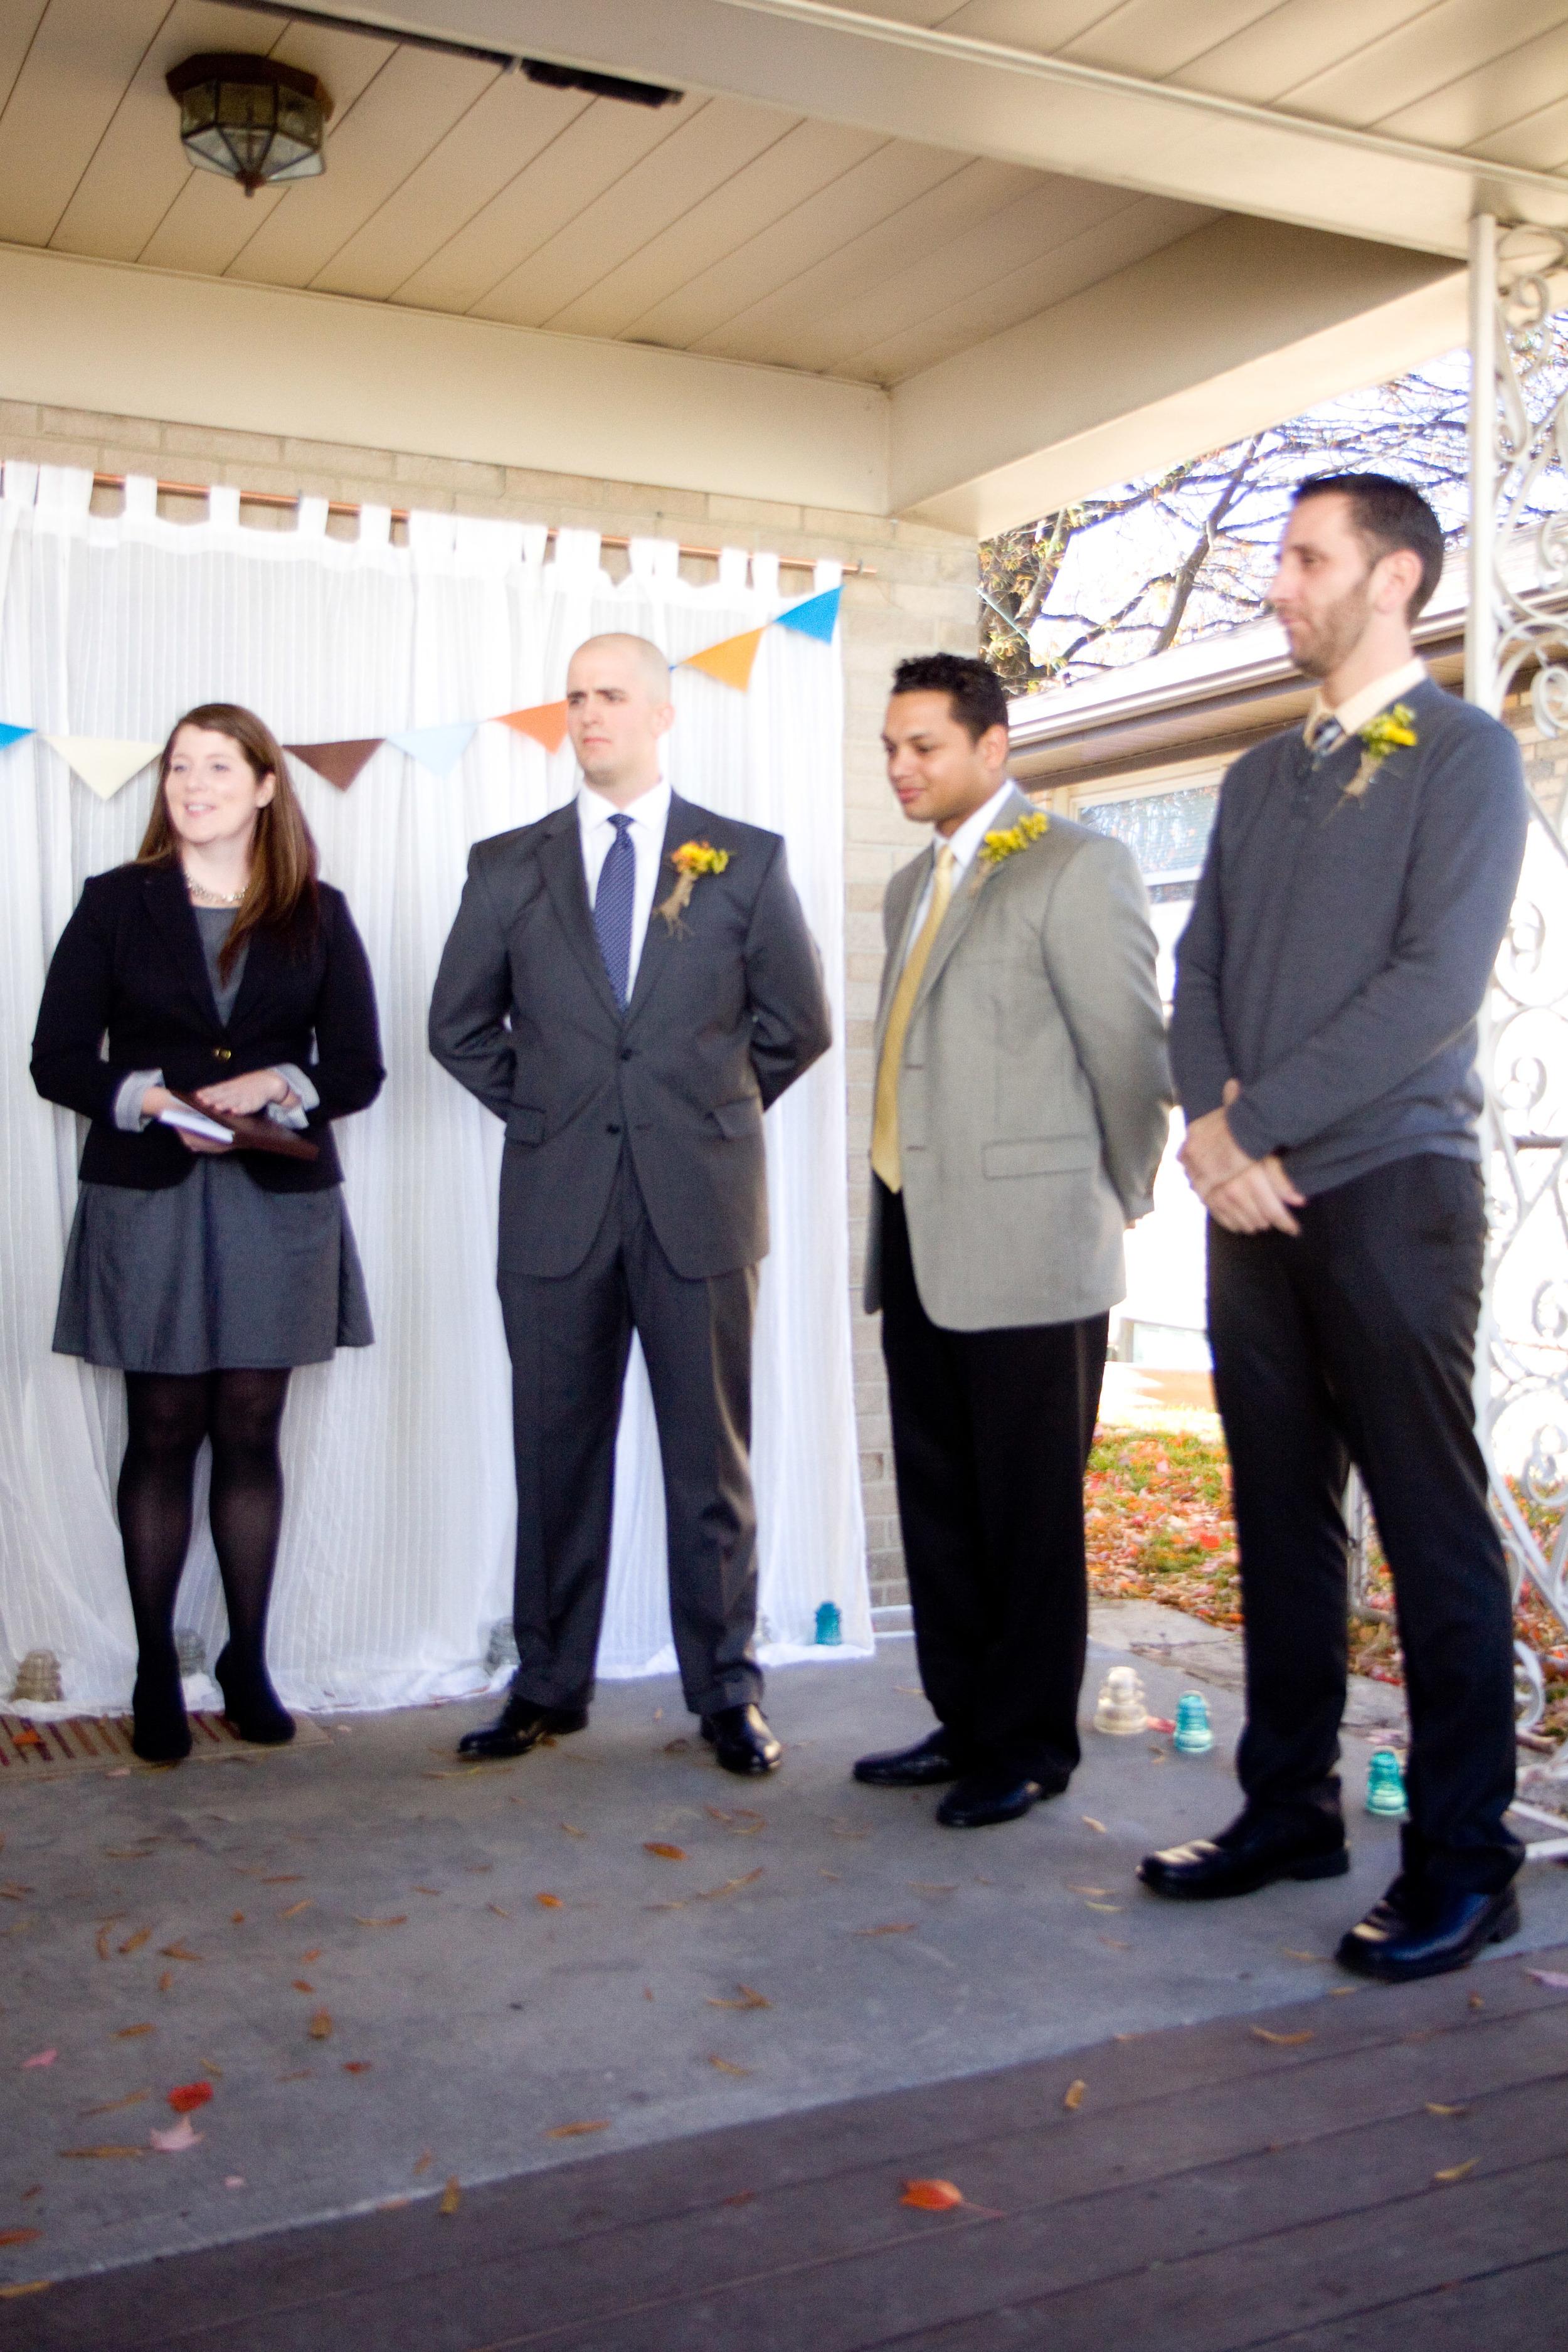 Wilson Bickel Wedding - Reception and Ceremony (92 of 526).jpg